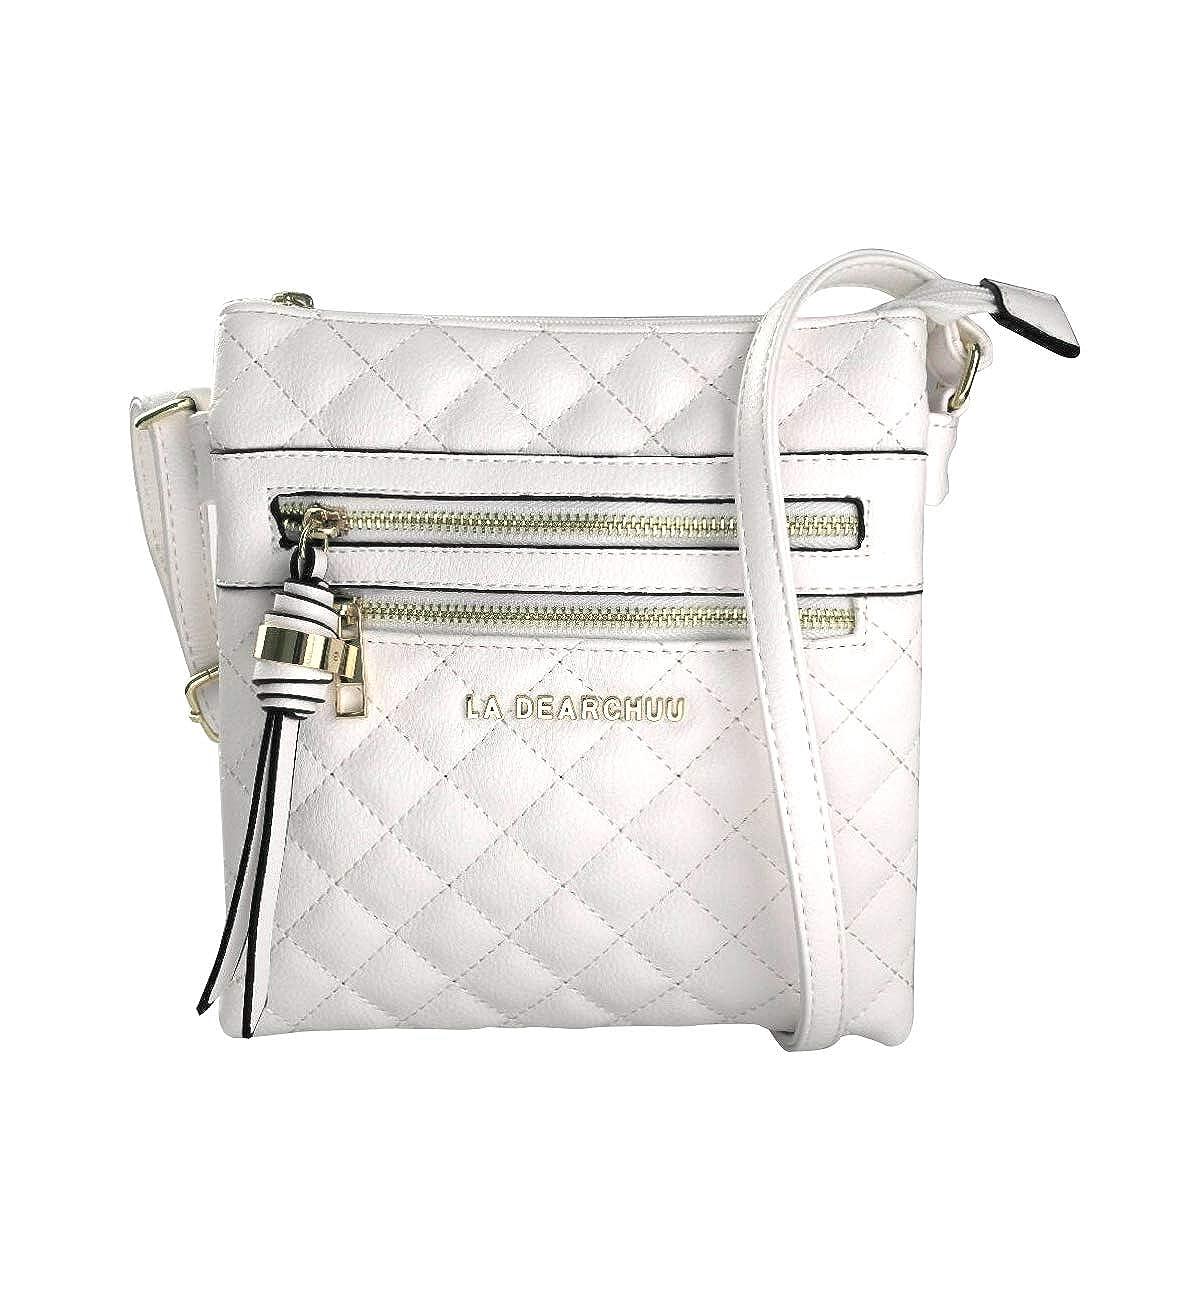 La Dearchuu Crossbody Purse for Women Lightweight Leather Crossbody Bags Multi Pocket Crossbody Shoulder Bag for Ladies